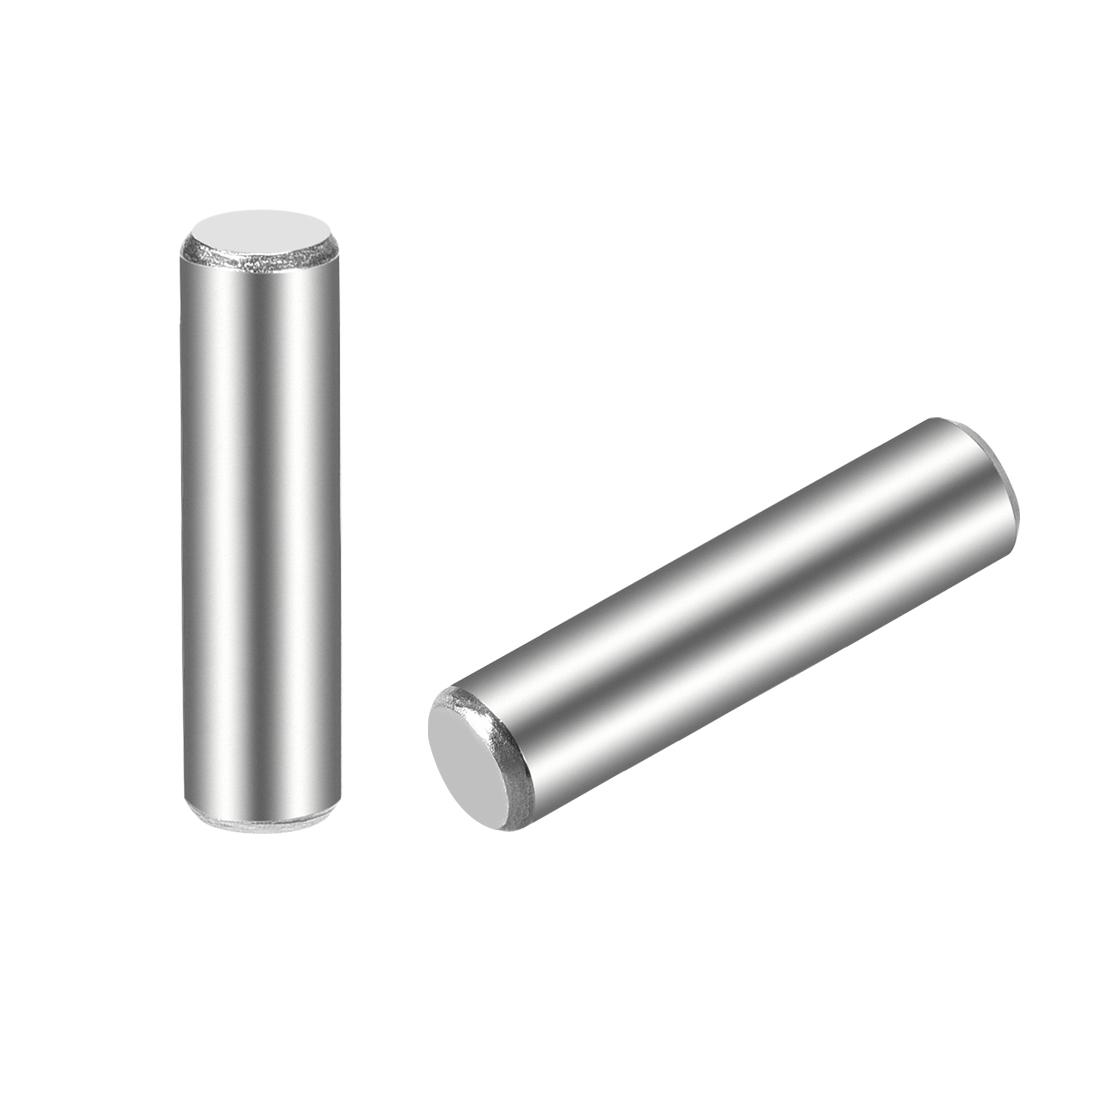 15Pcs 5mm x 20mm Dowel Pin 304 Stainless Steel Shelf Support Pin Fasten